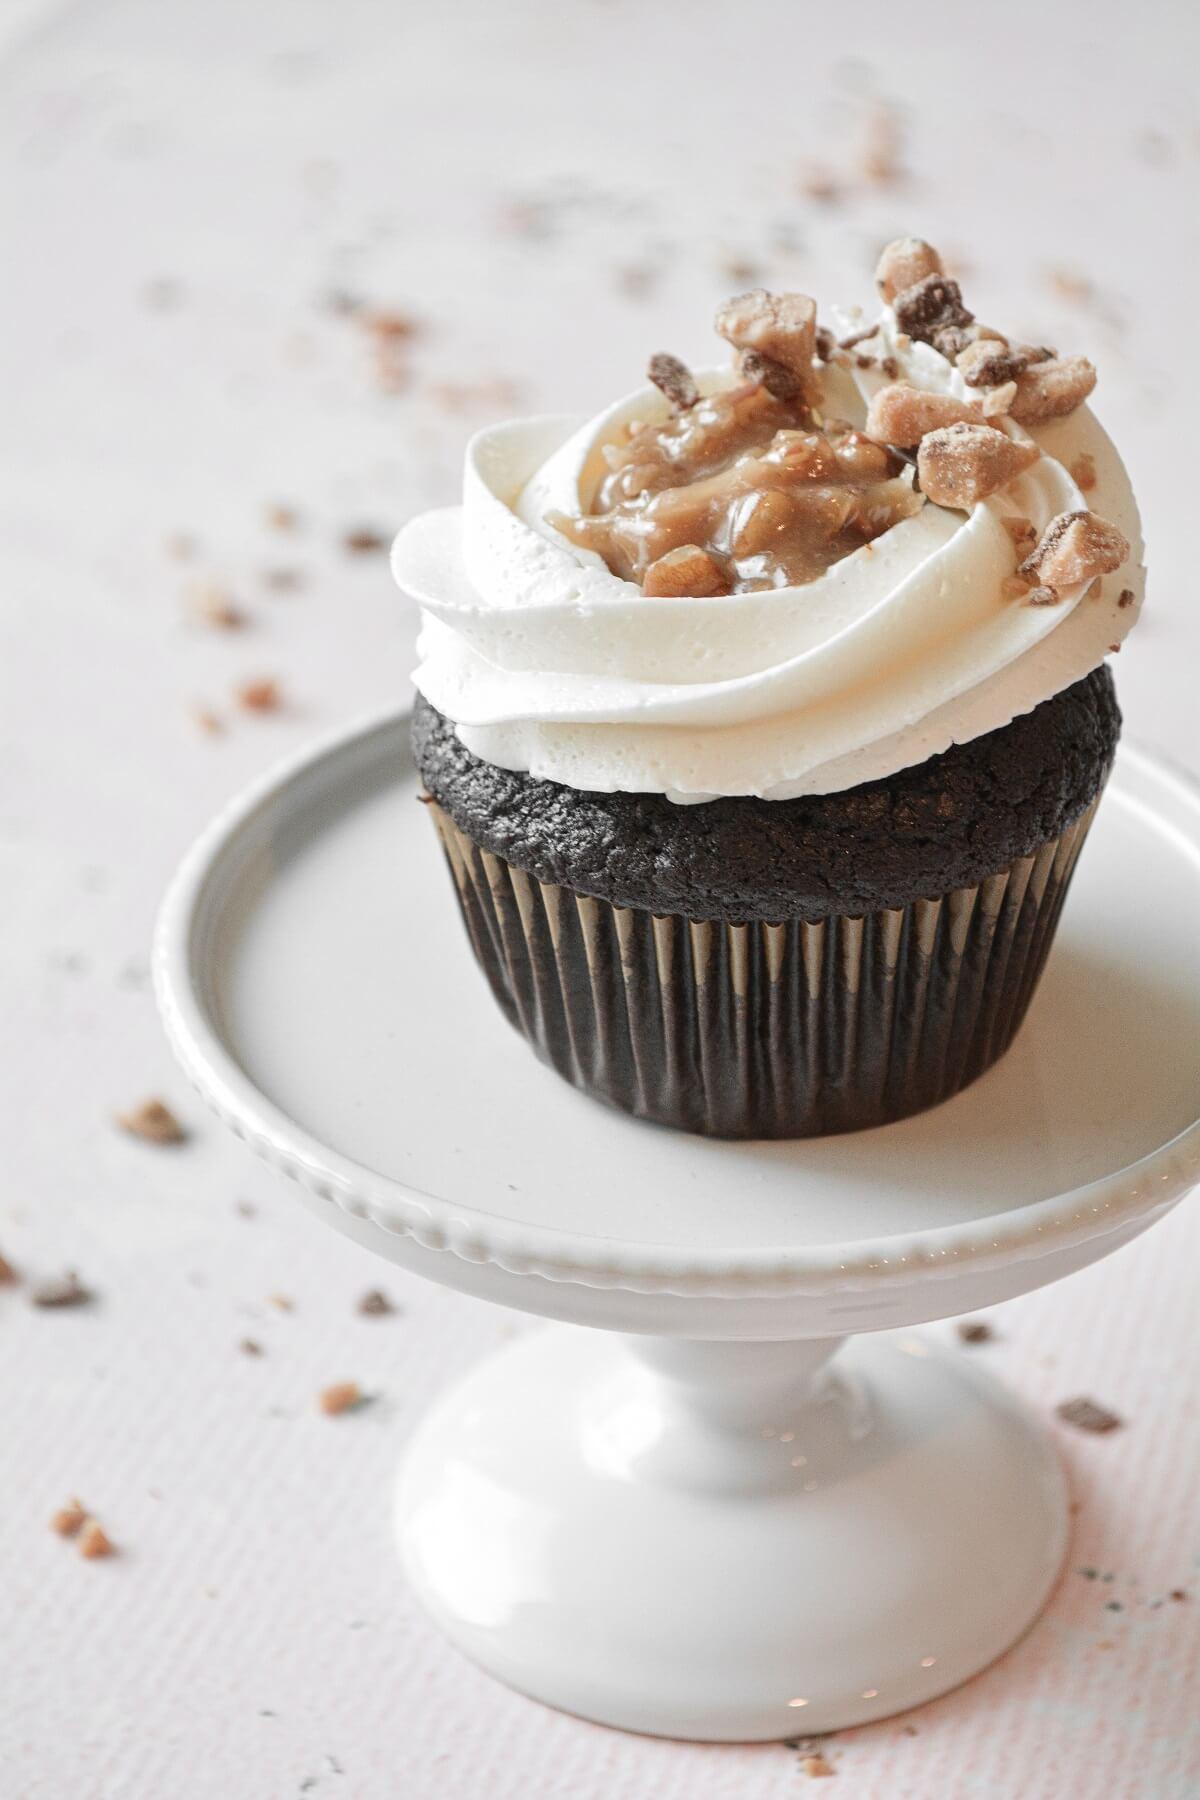 A German chocolate bourbon cupcake with vanilla buttercream and pecan, coconut caramel filling.